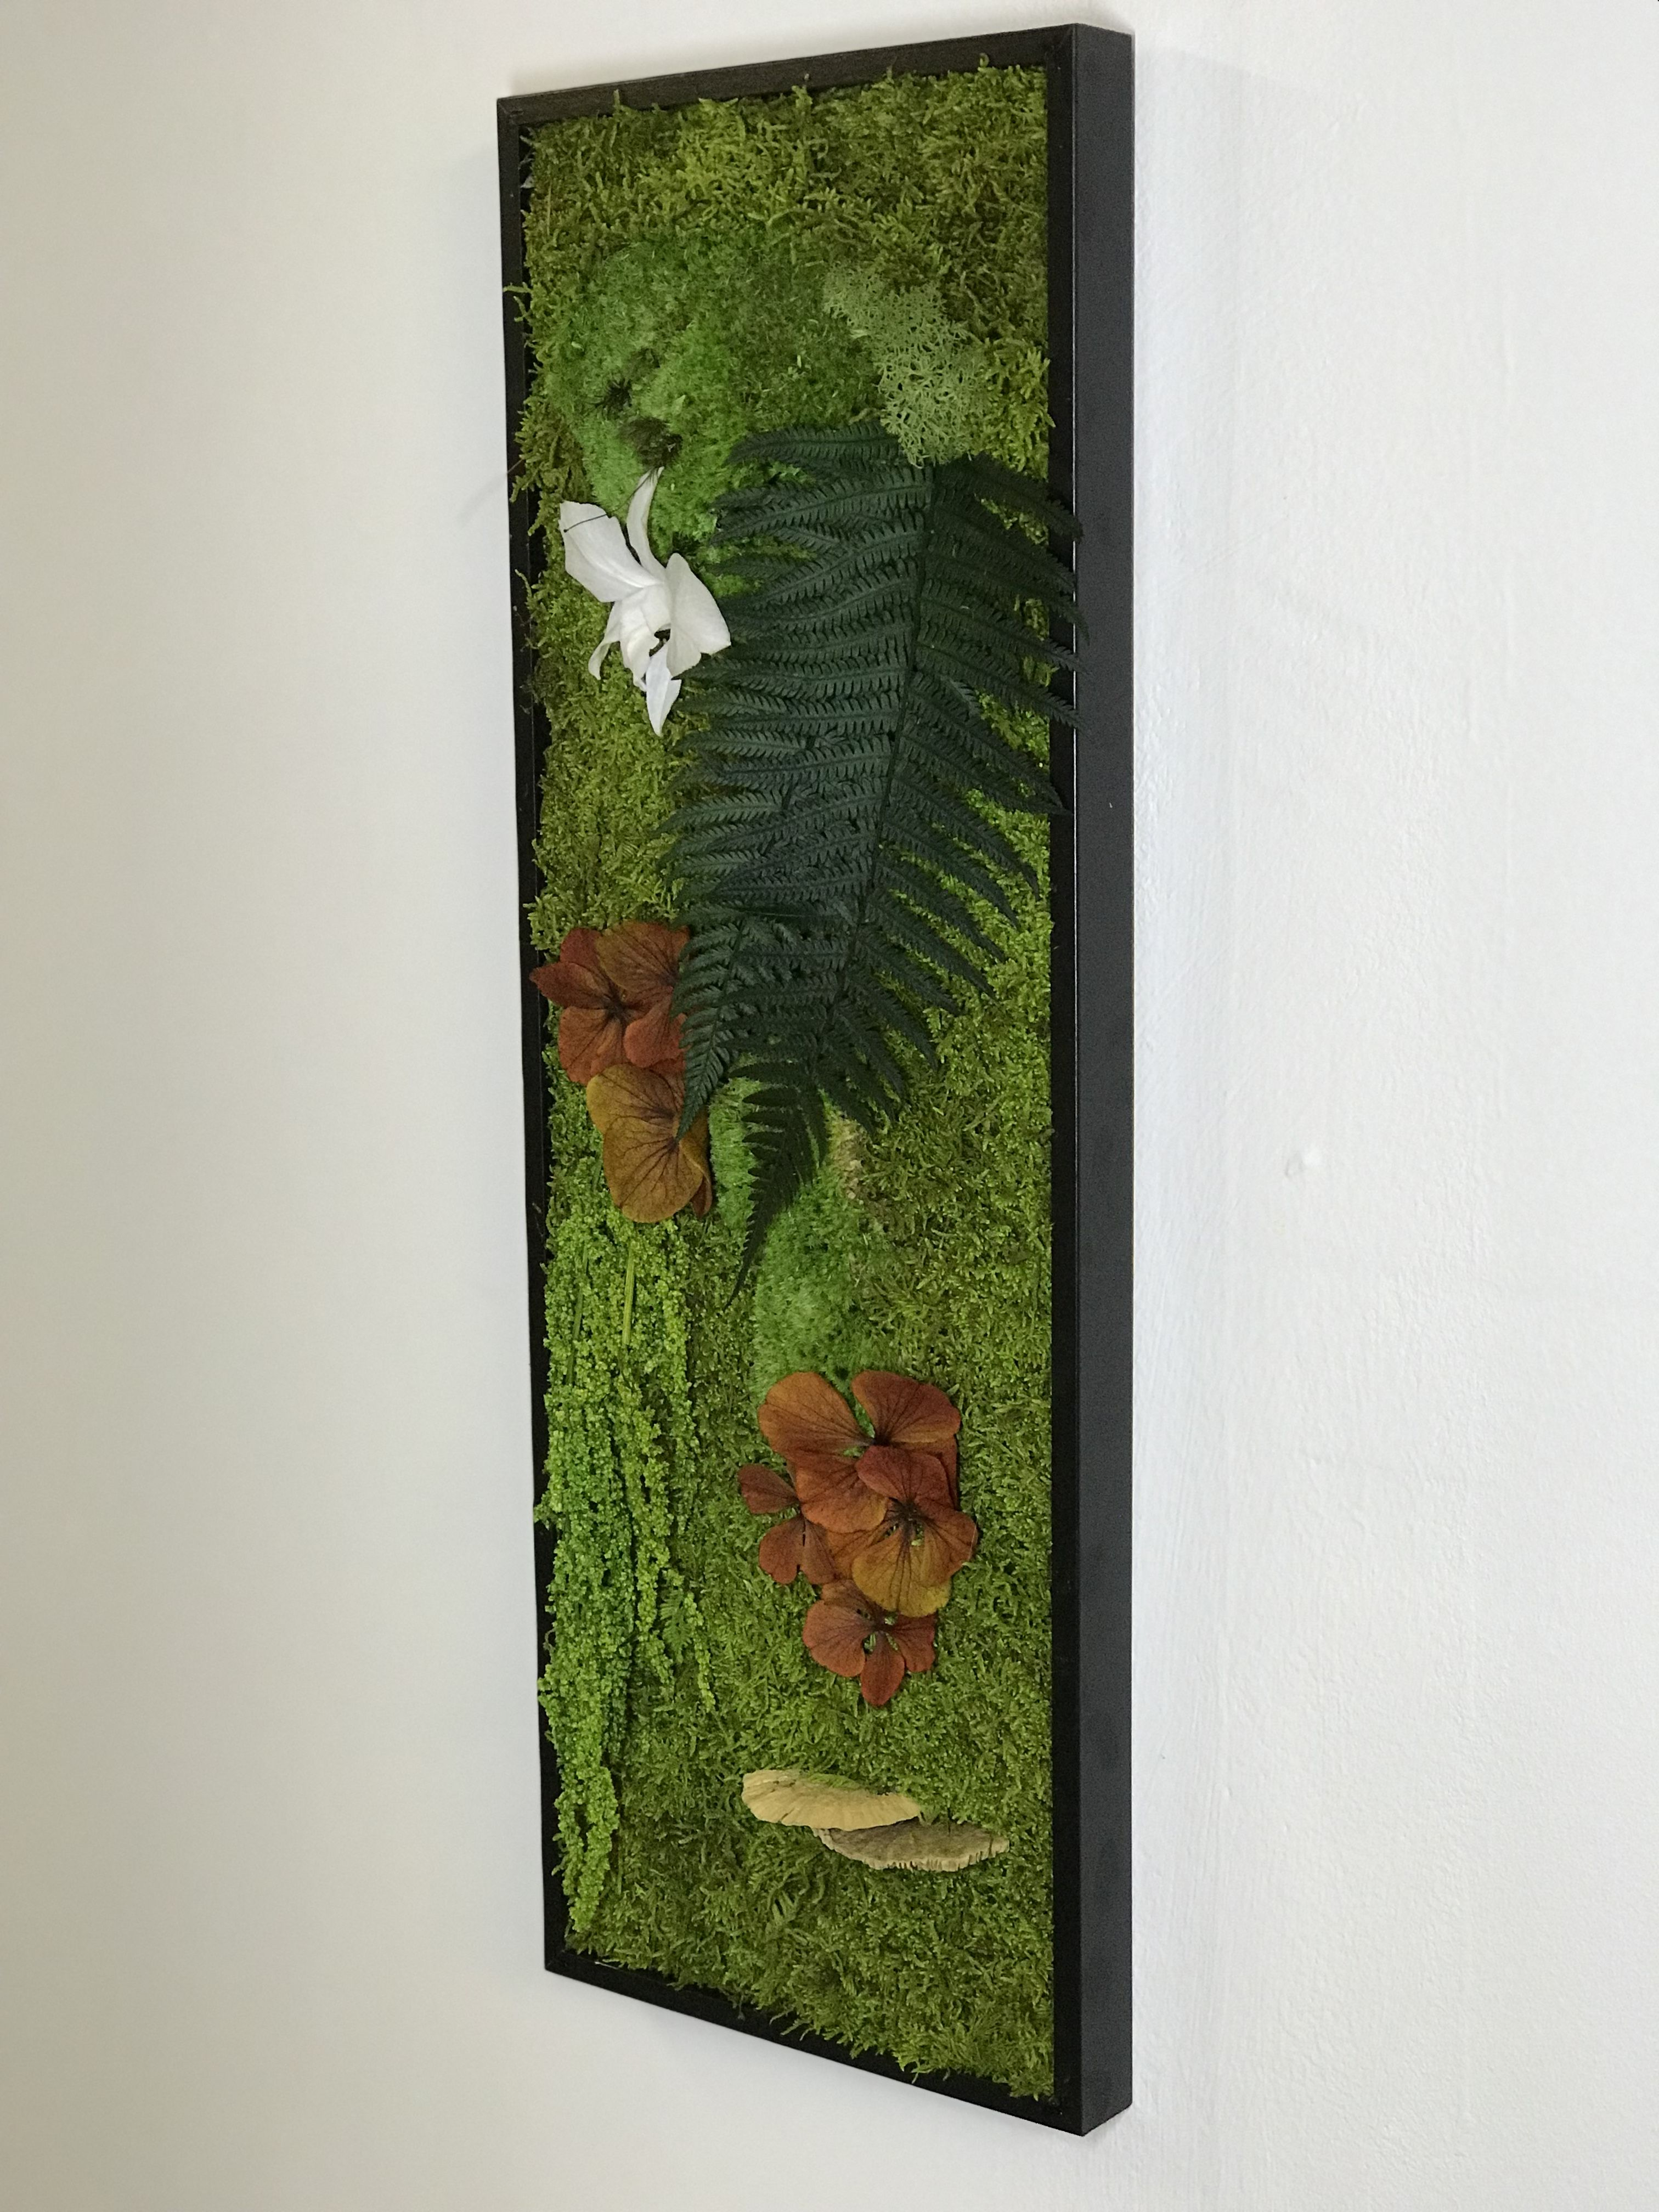 L Ere Vegetale Indoor Vegetal Design La Decoration D Interieur A